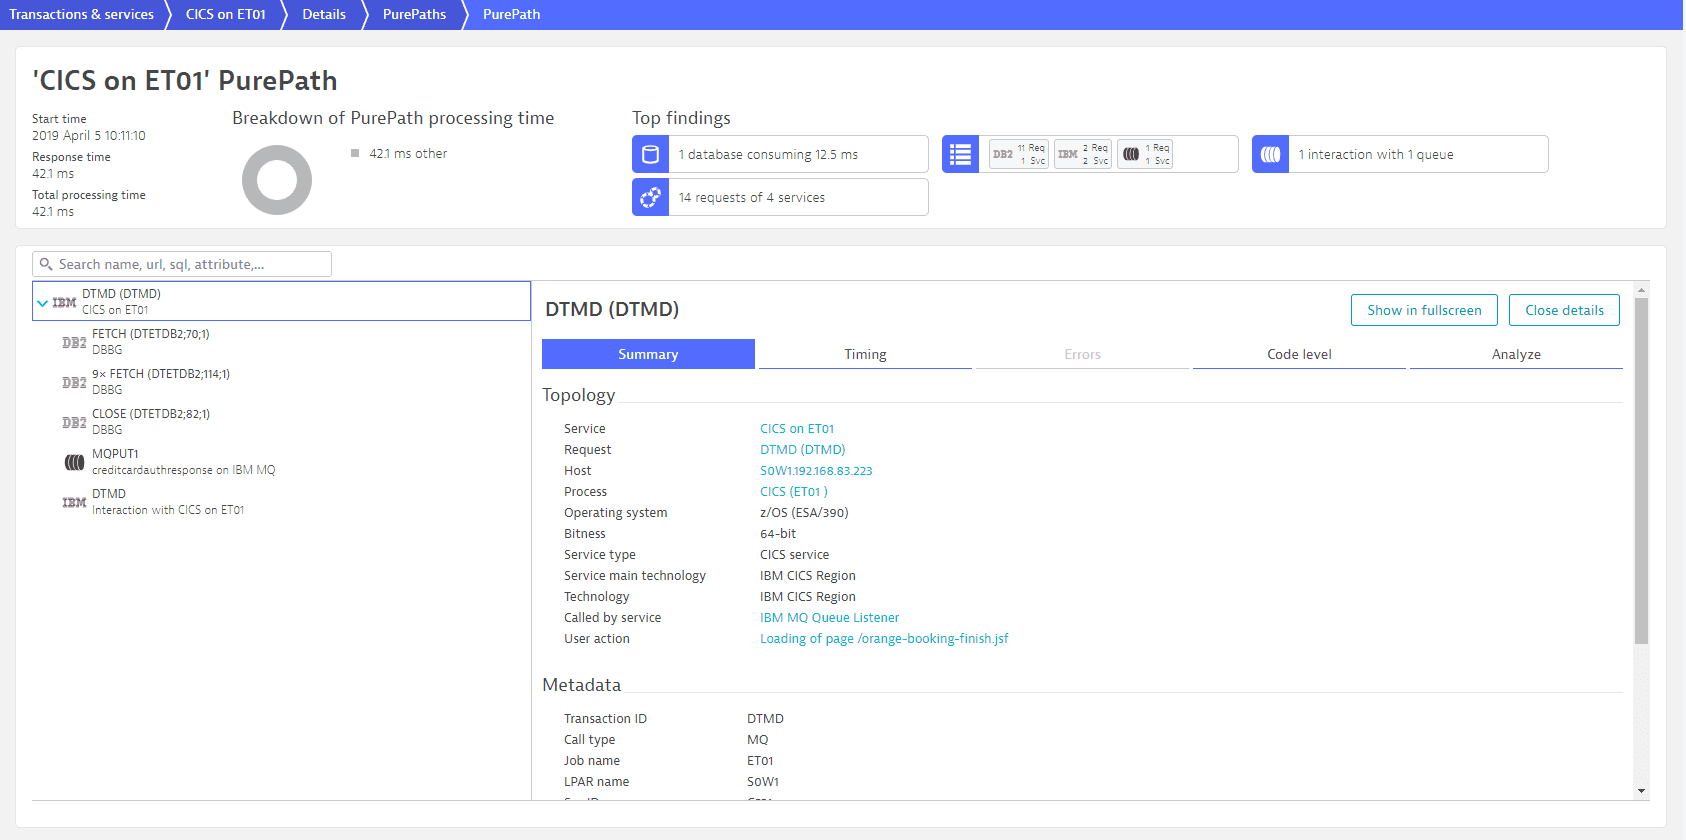 Easytravel PurePath - summary